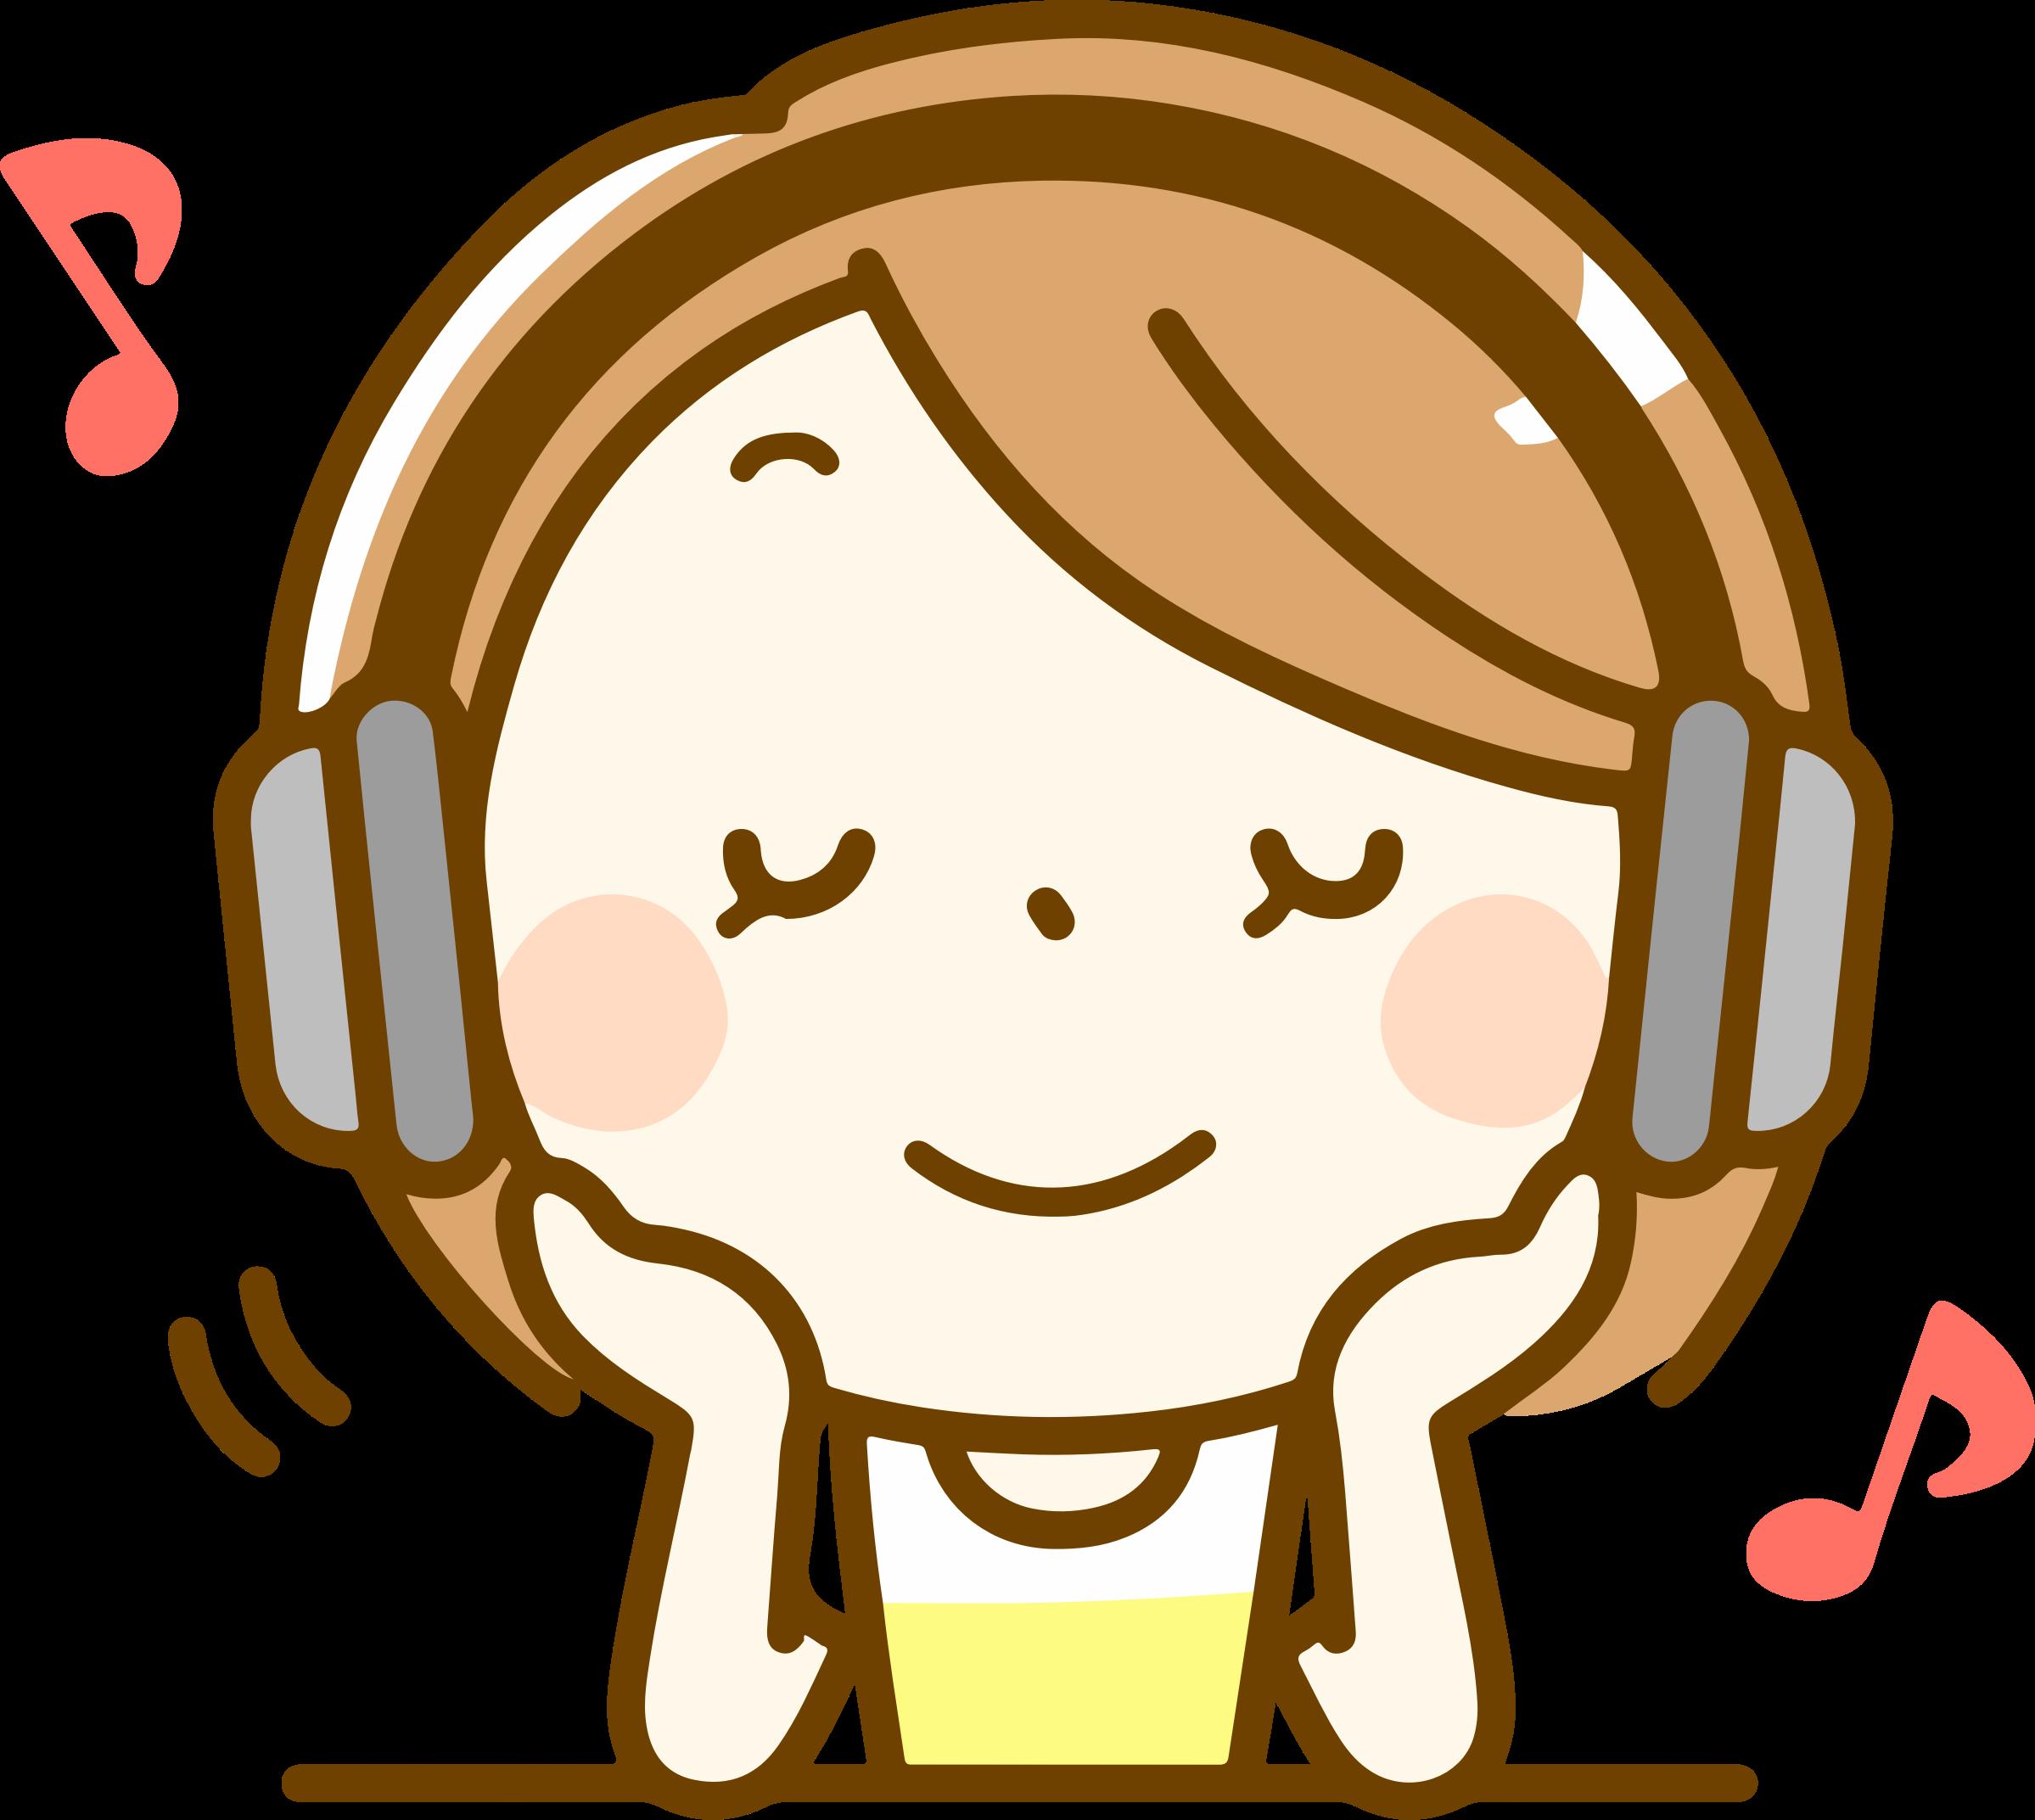 Listening images clipart transparent download Girl listening to music clipart clipart images gallery for free ... transparent download